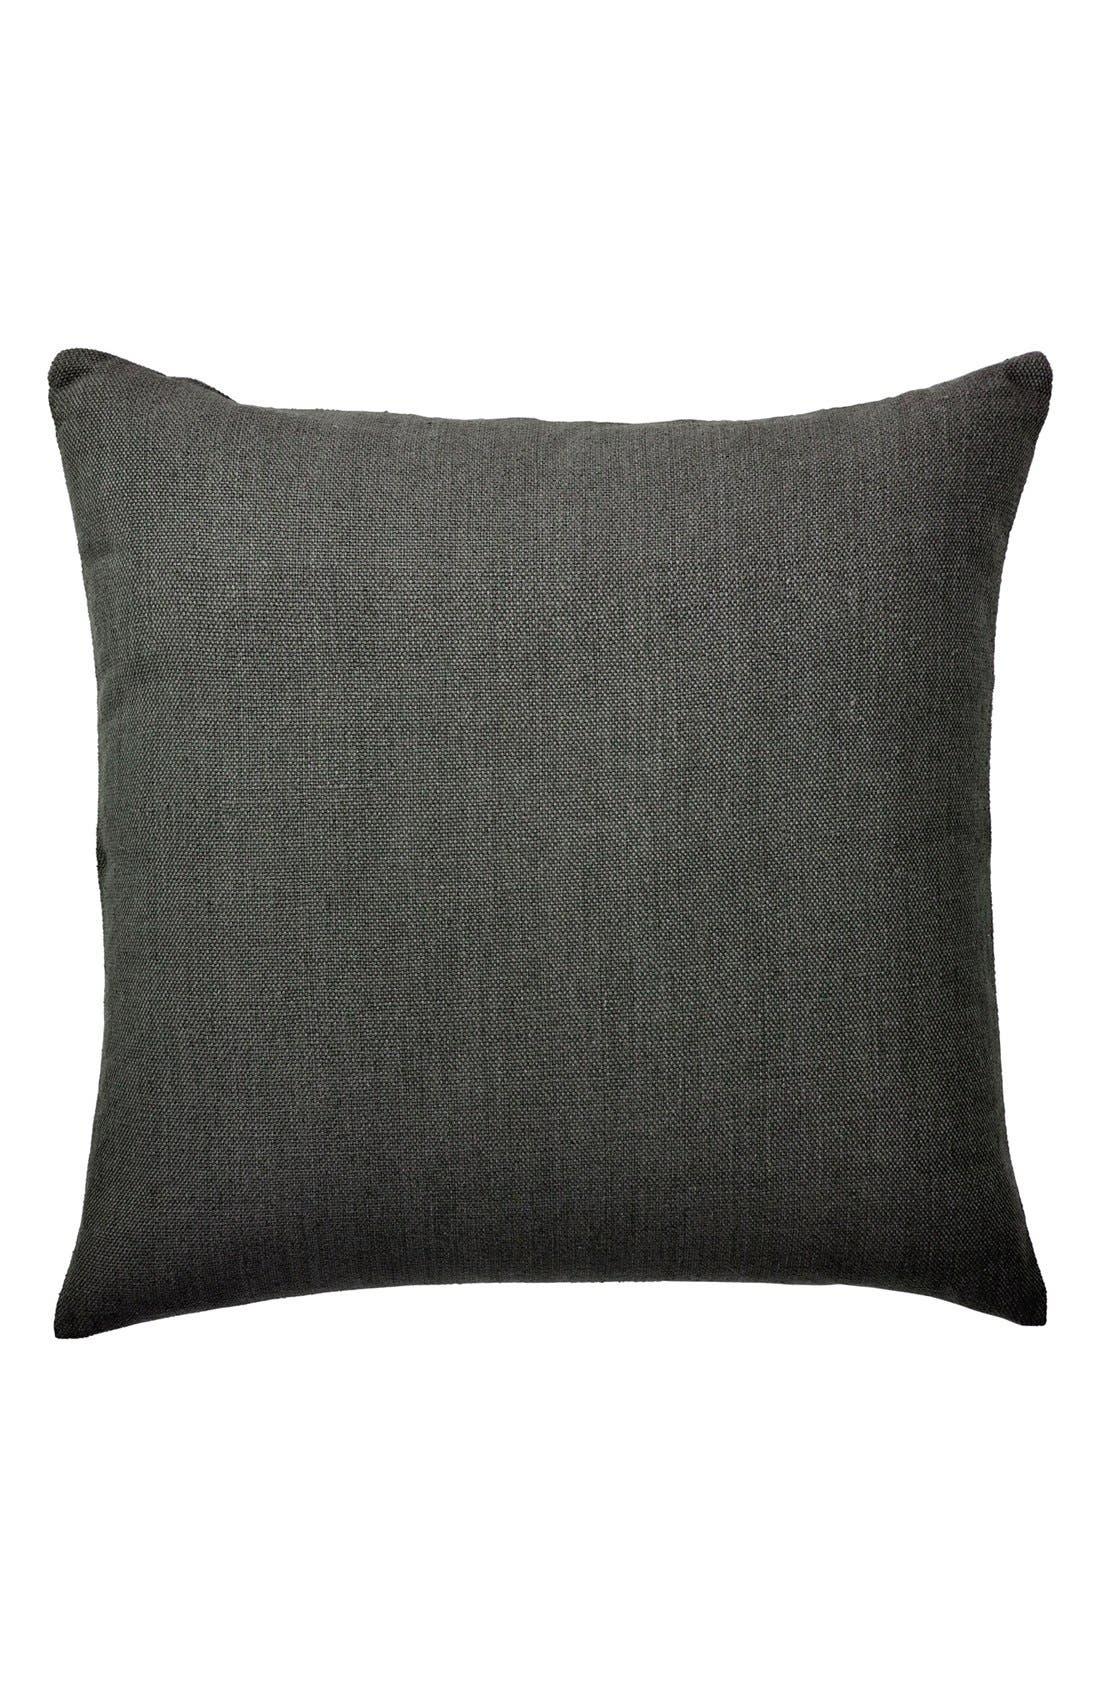 Alternate Image 1 Selected - Donna Karan 'Blooms' Euro Pillow Sham (Online Only)